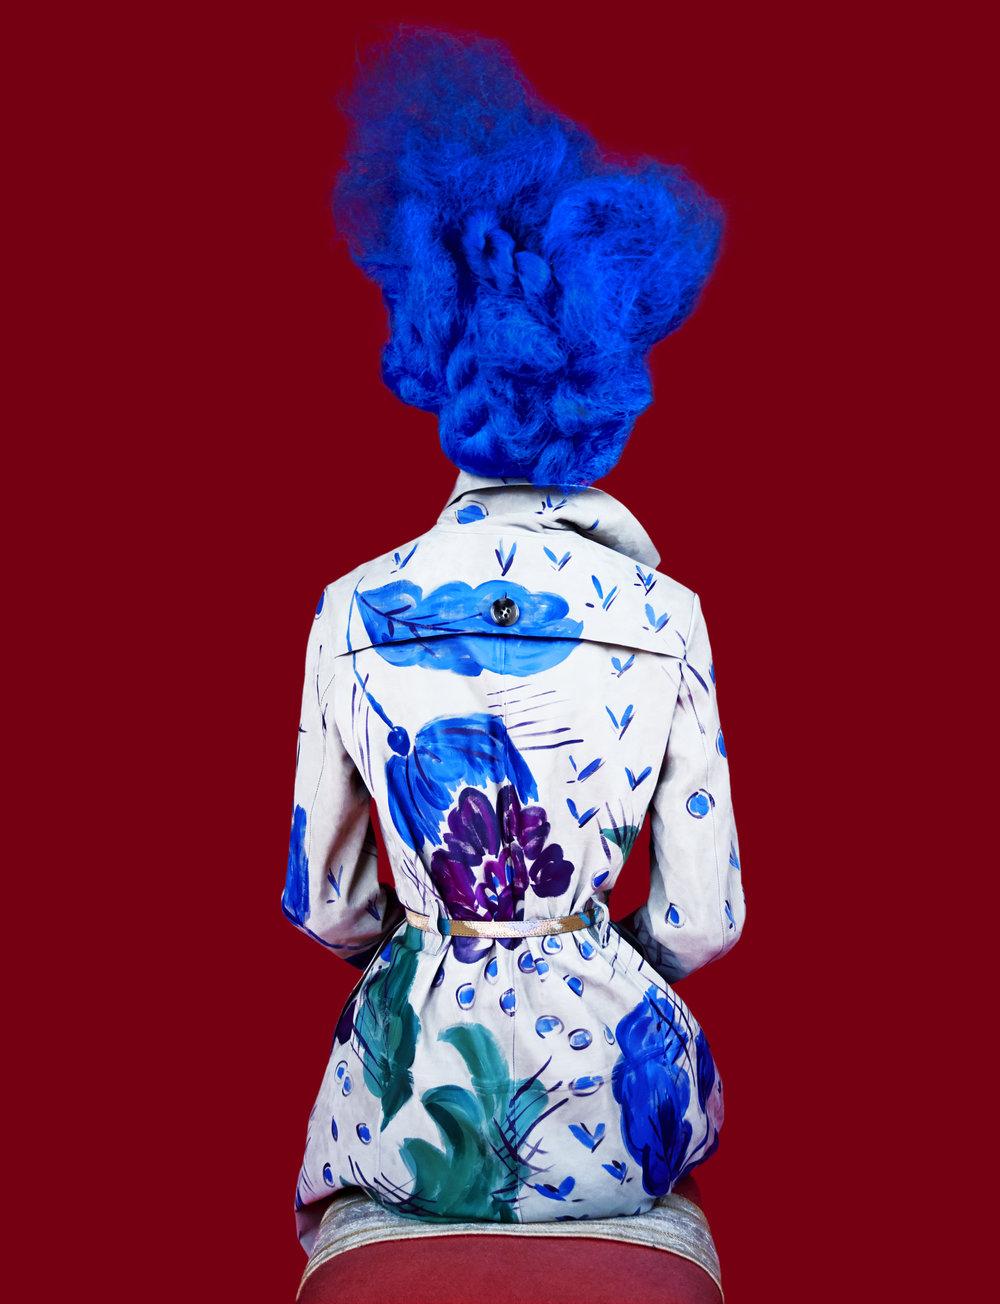 Erik Madigan Heck.   Numero Paris, Old Future, 2012.  ©Erik Madigan Heck/Courtesy Staley-Wise Gallery, New York